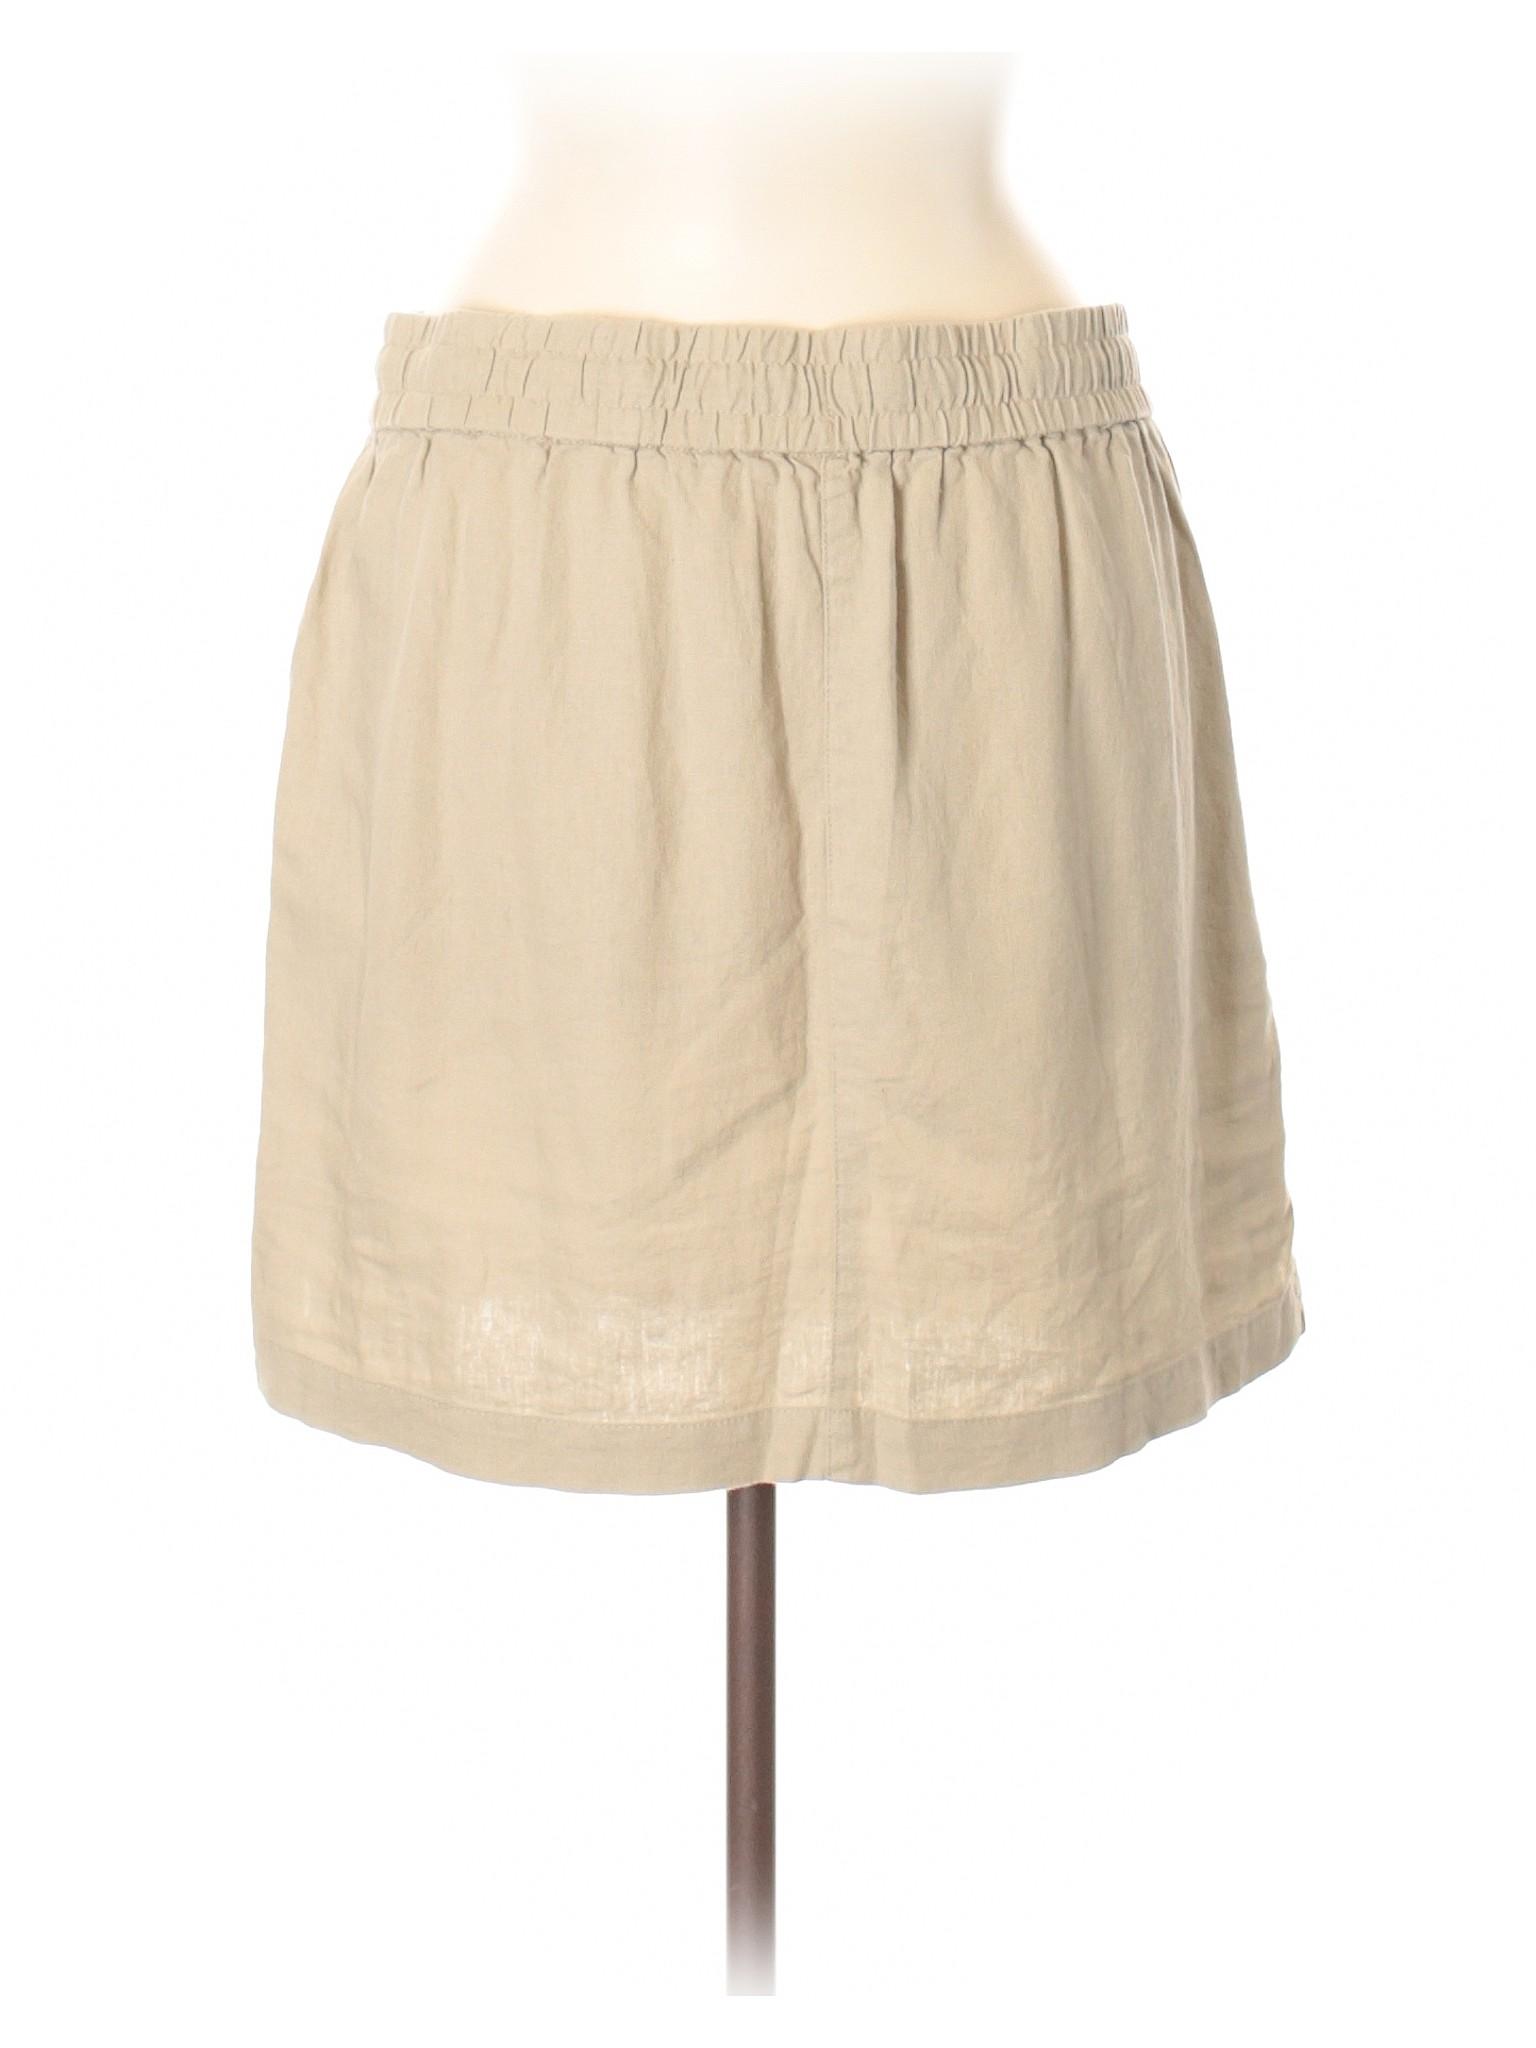 Boutique Casual Boutique Skirt Casual aPq1Hxa4